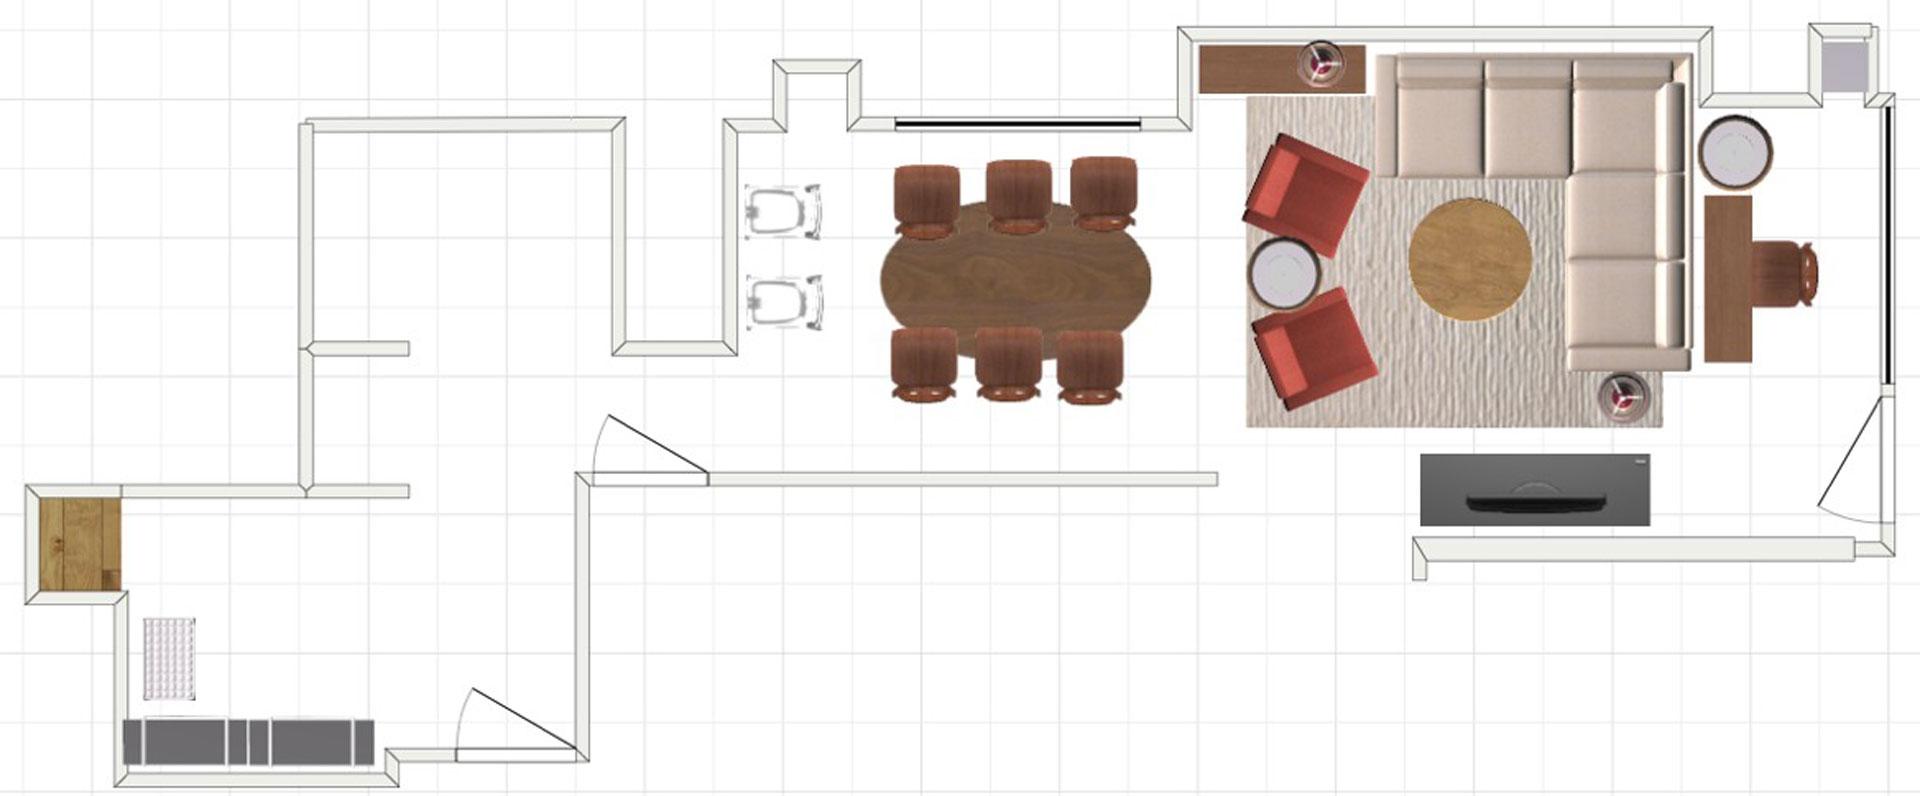 Small Space Floor Plan B